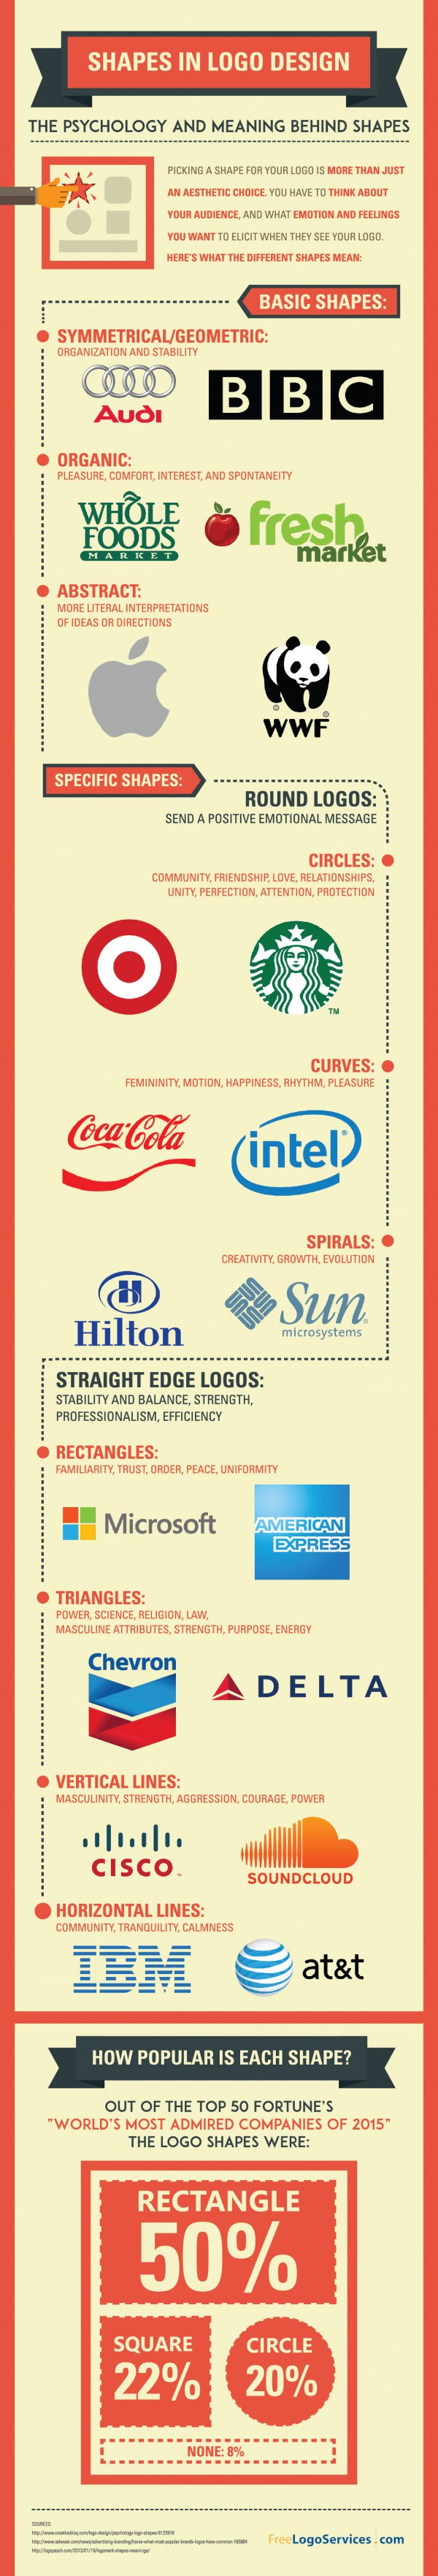 shapes-logos-infographics.jpg